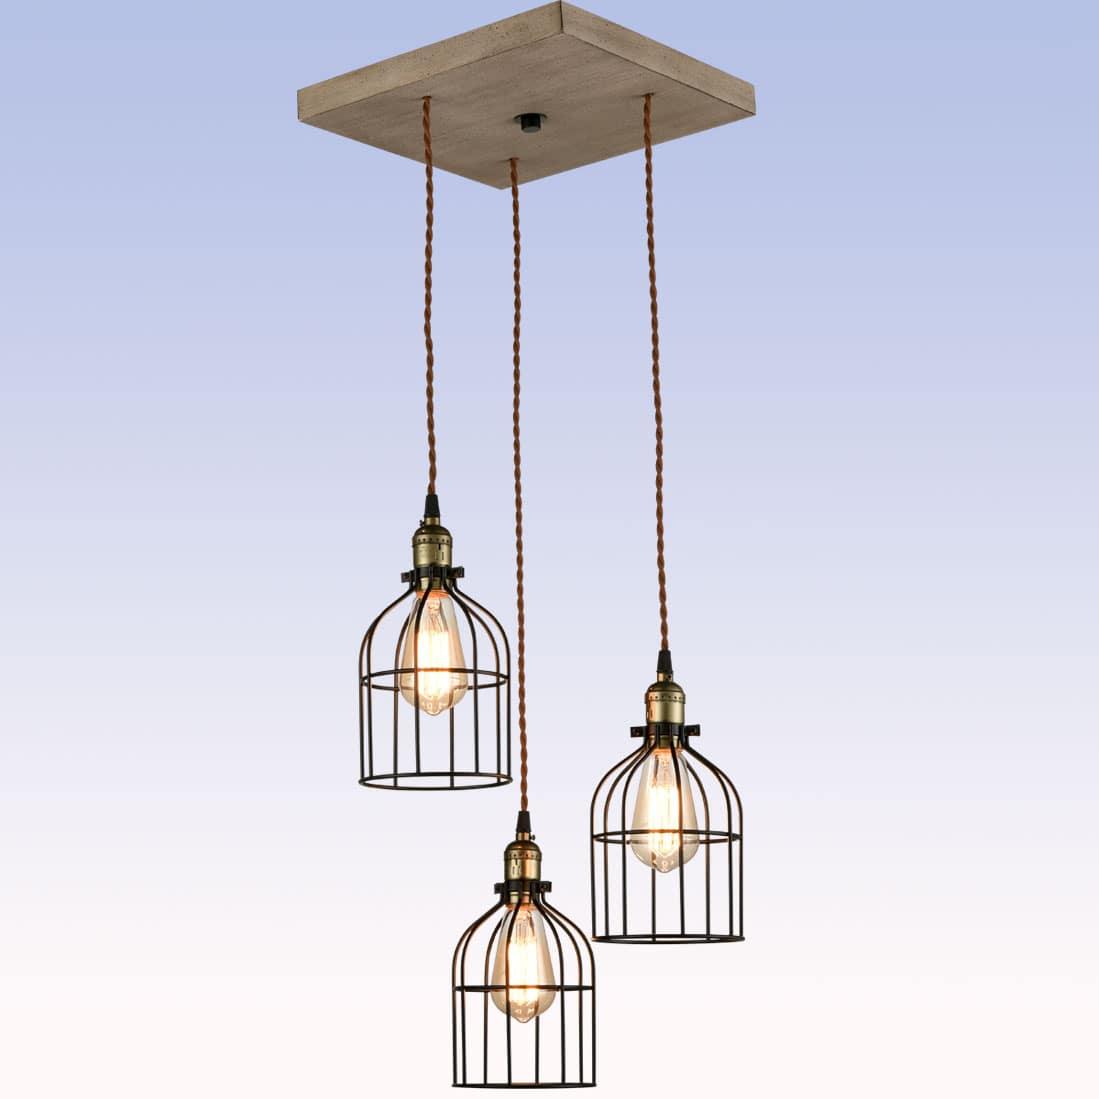 Industrial Kitchen Pendant Light Edison Metal Caged Hanging Light Fixture